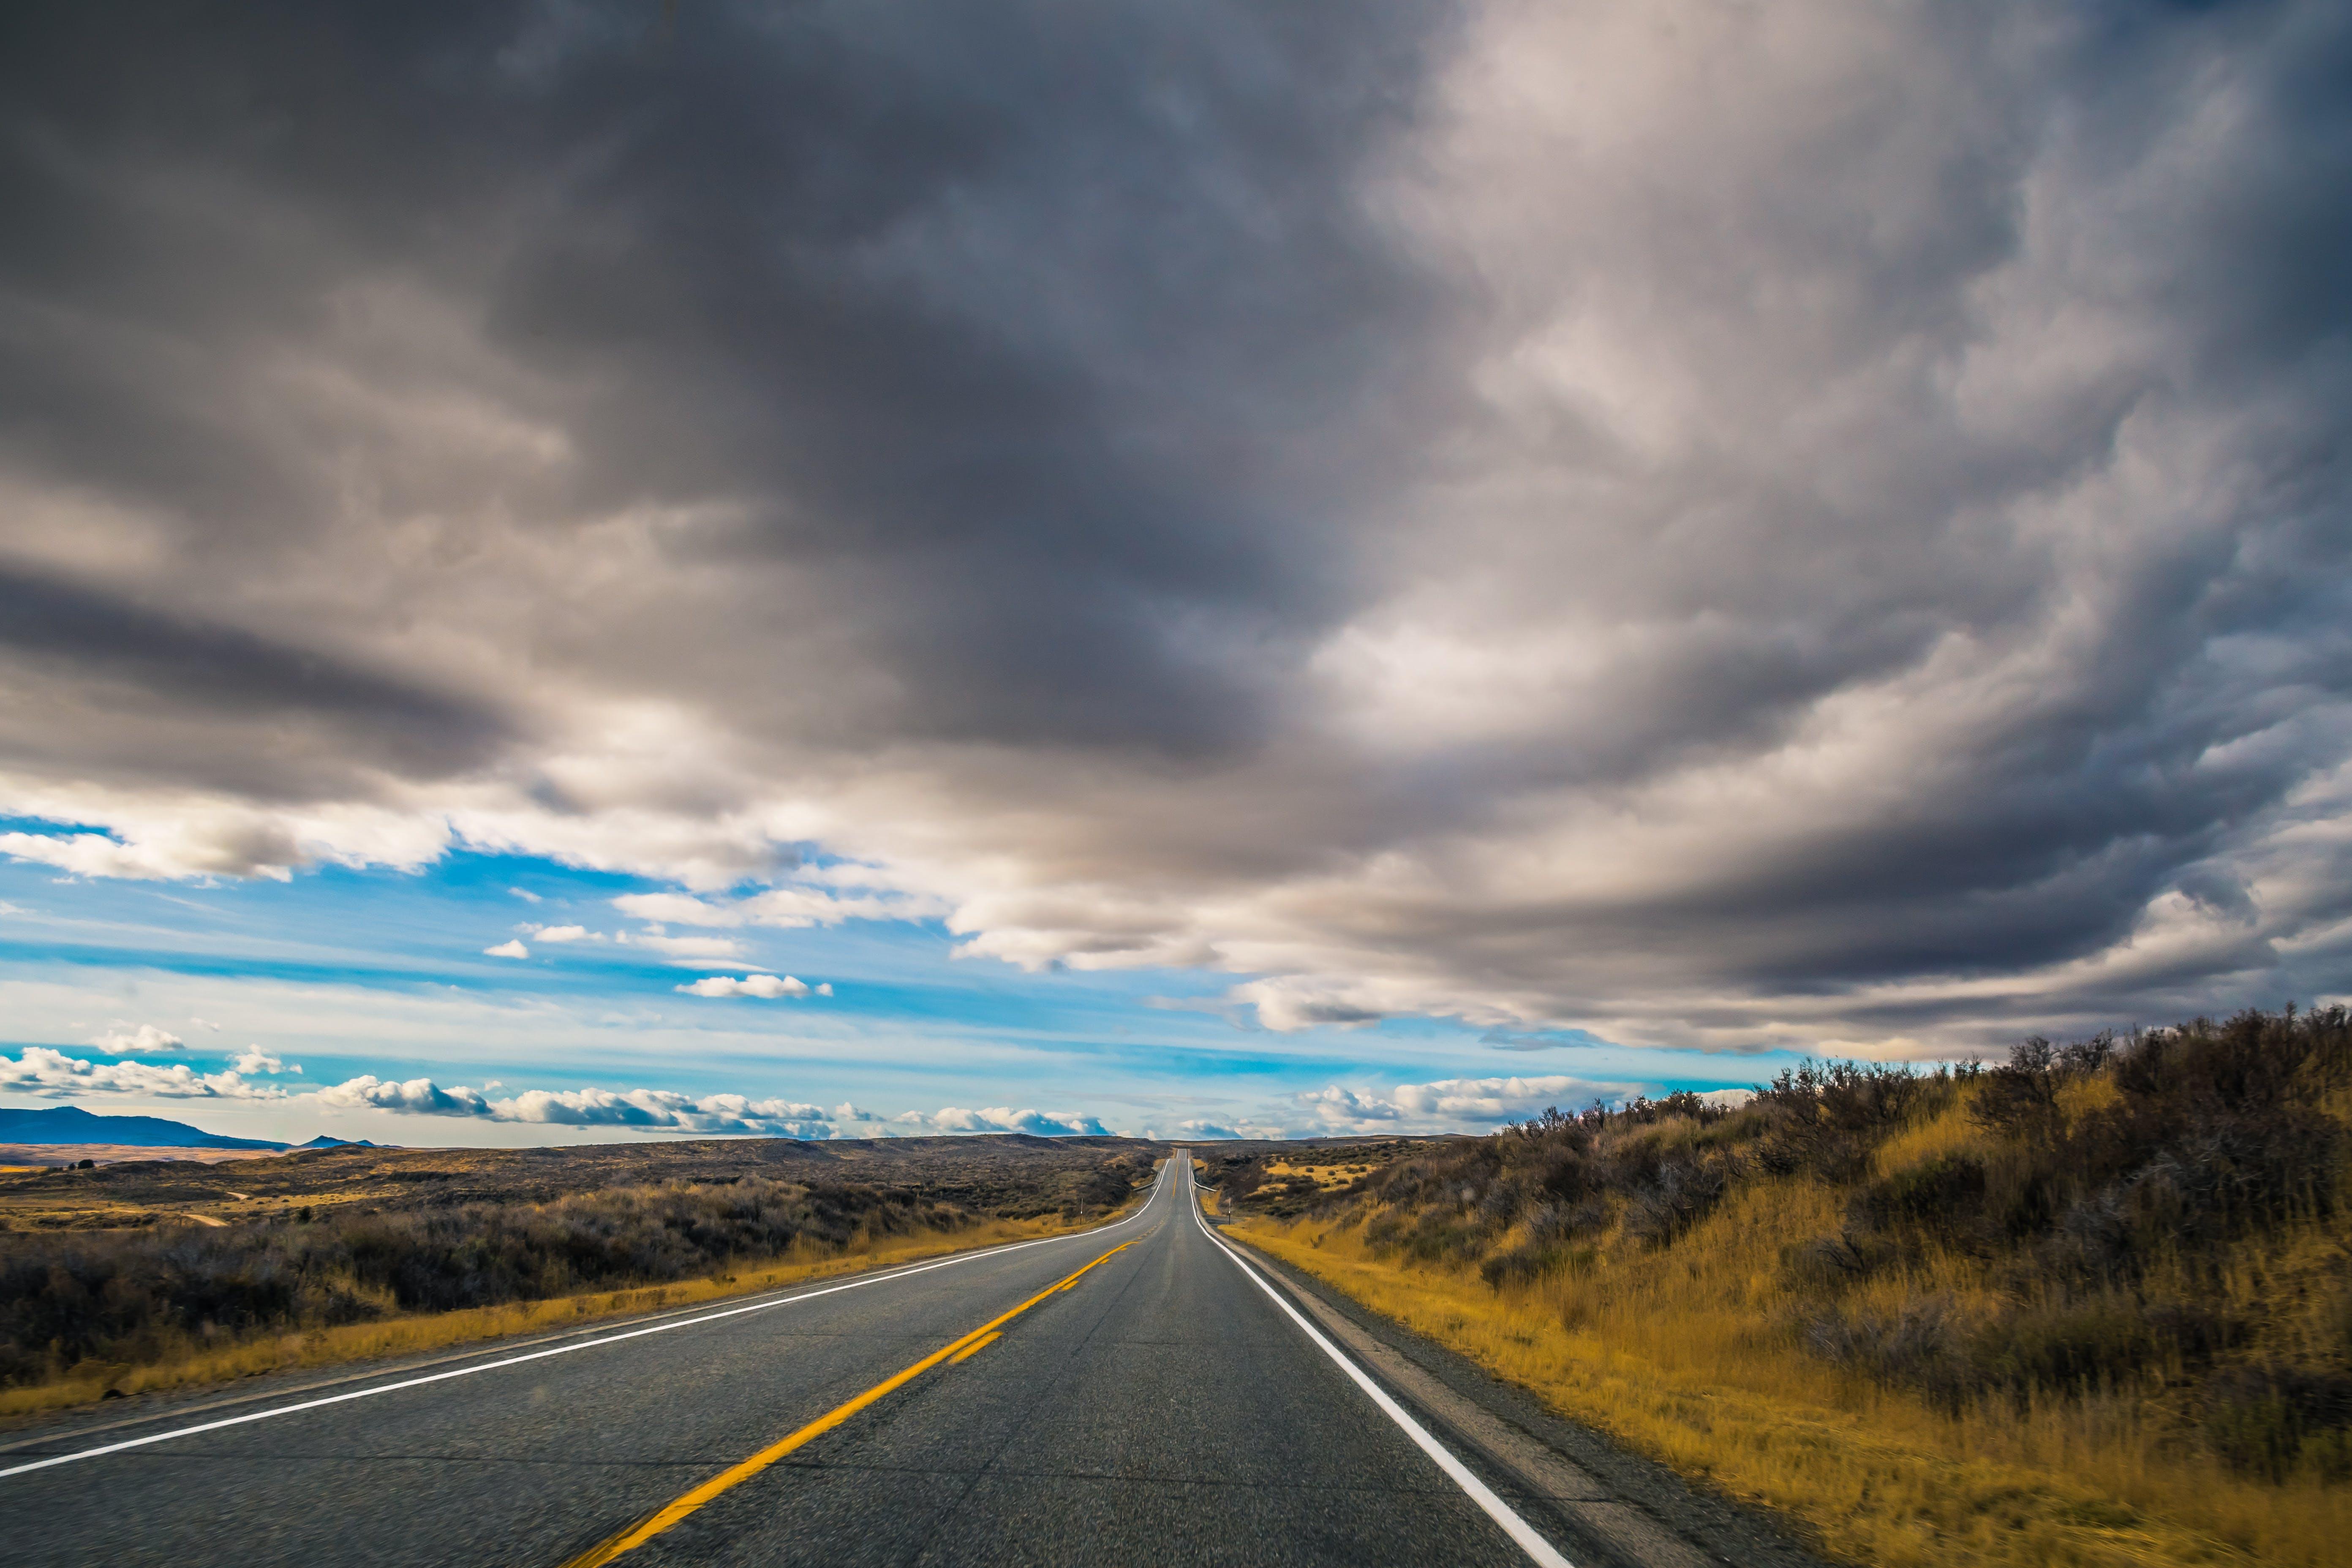 Gratis arkivbilde med asfalt, hovedvei, perspektiv, skyer